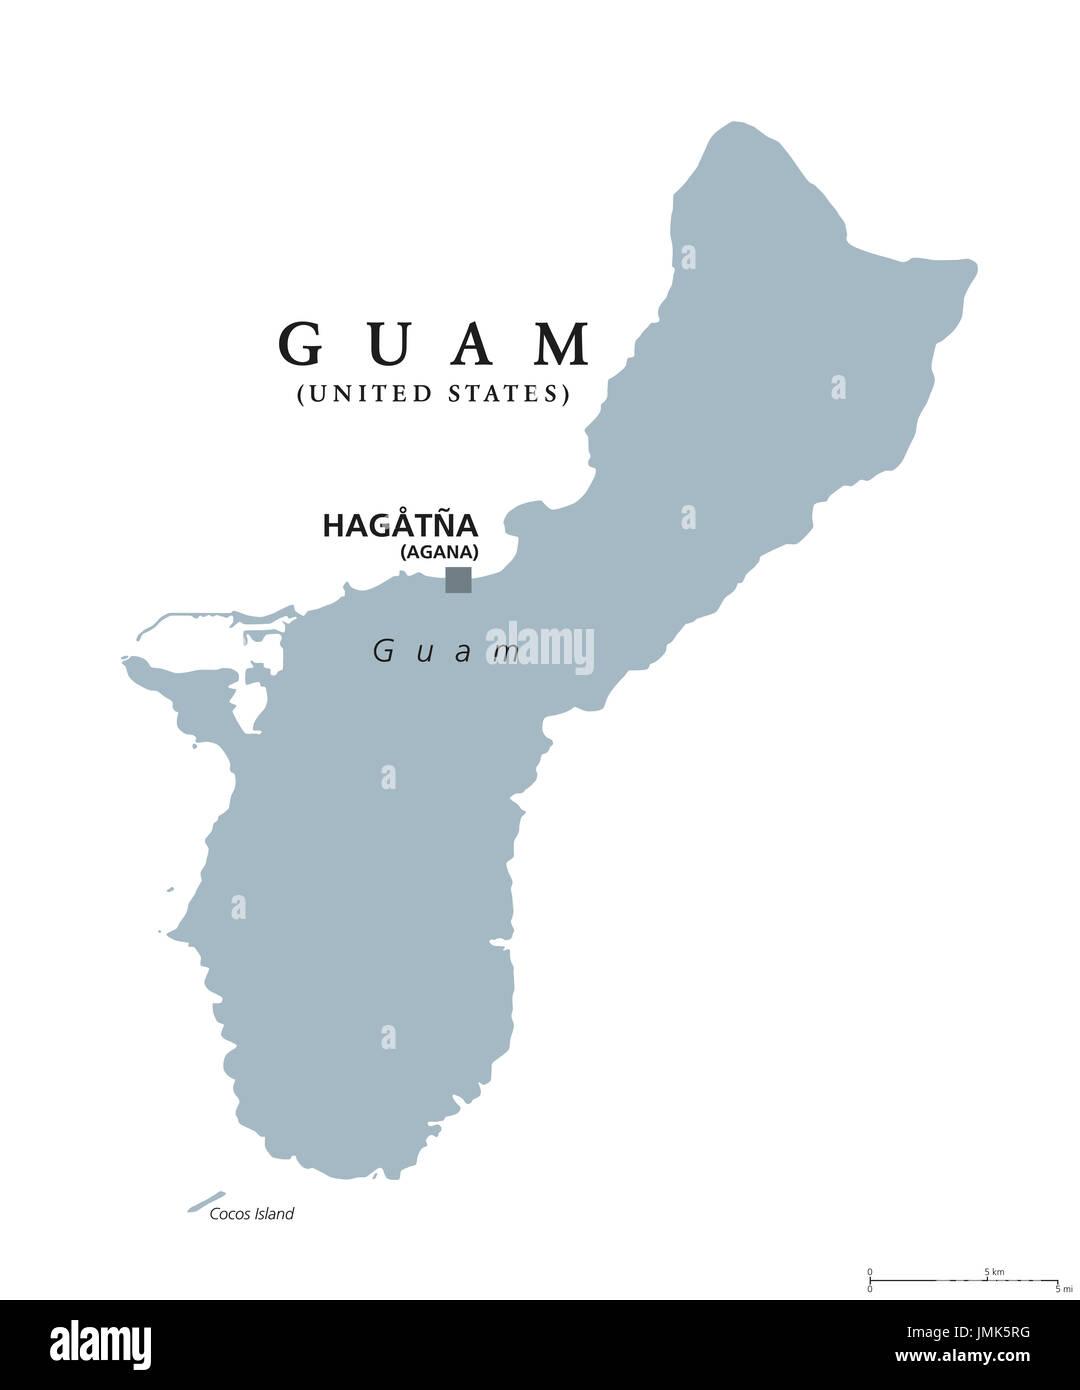 Guam Map Stockfotos & Guam Map Bilder - Alamy